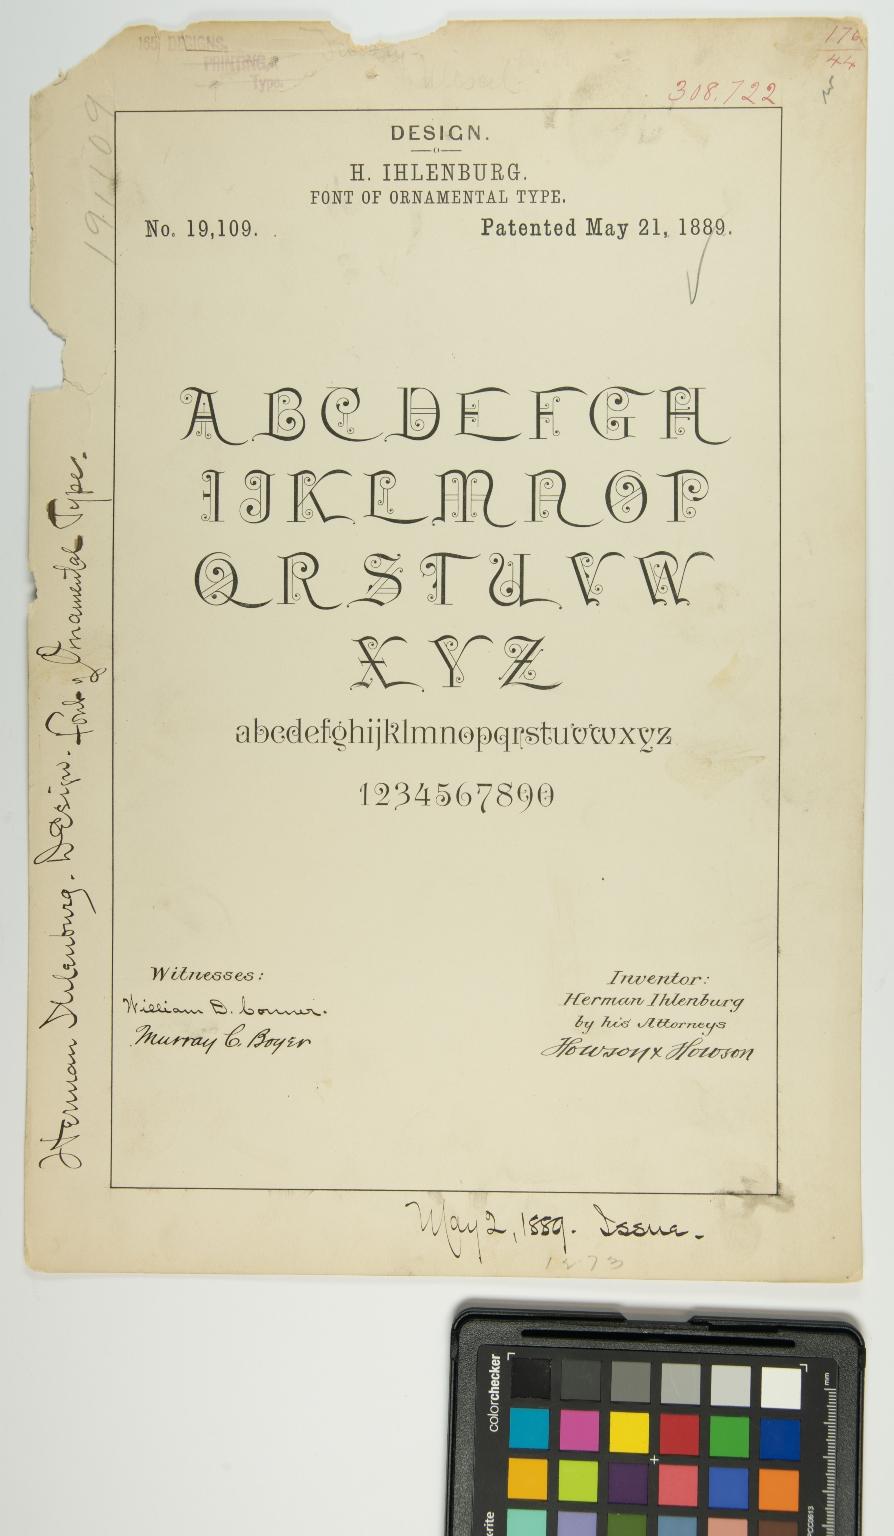 H. Ihlenburg, Font of Ornamental Type